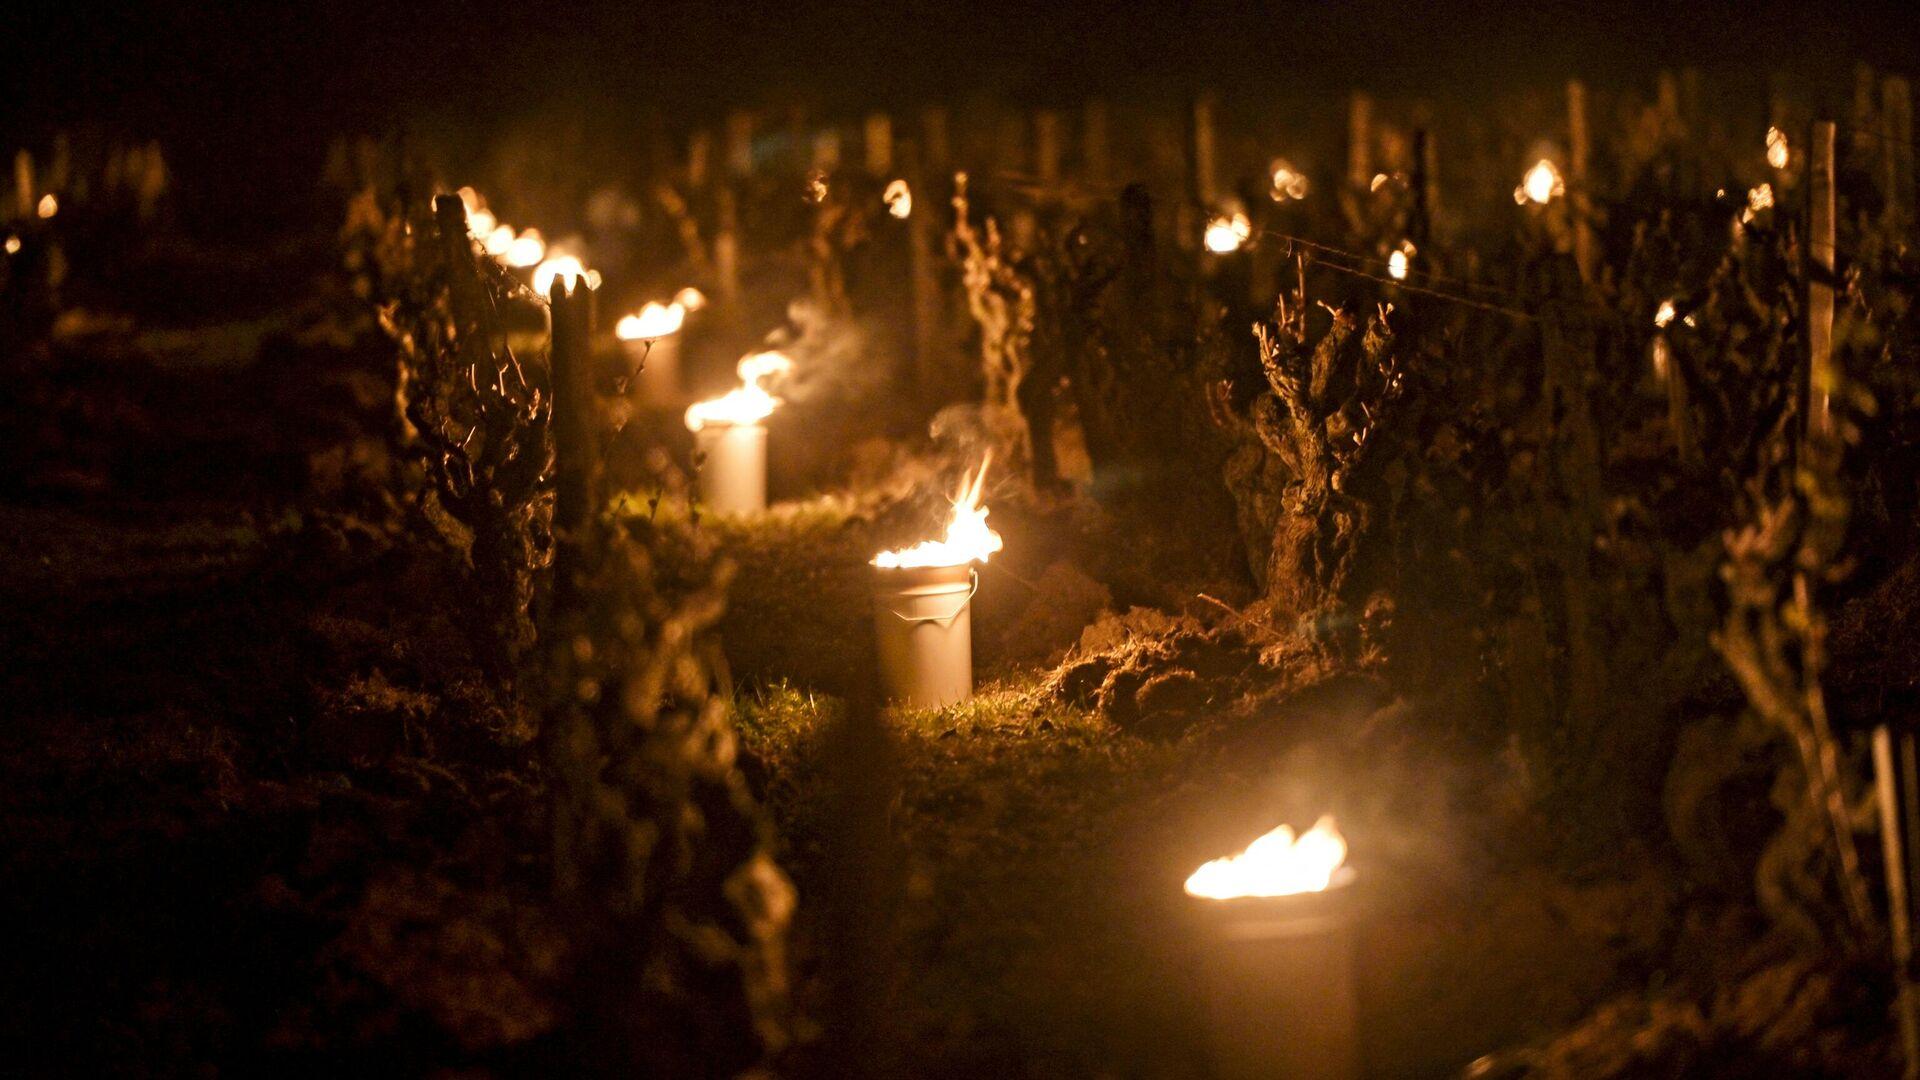 Velas cerca de las viñas de Vouvray (Francia) - Sputnik Mundo, 1920, 21.04.2021